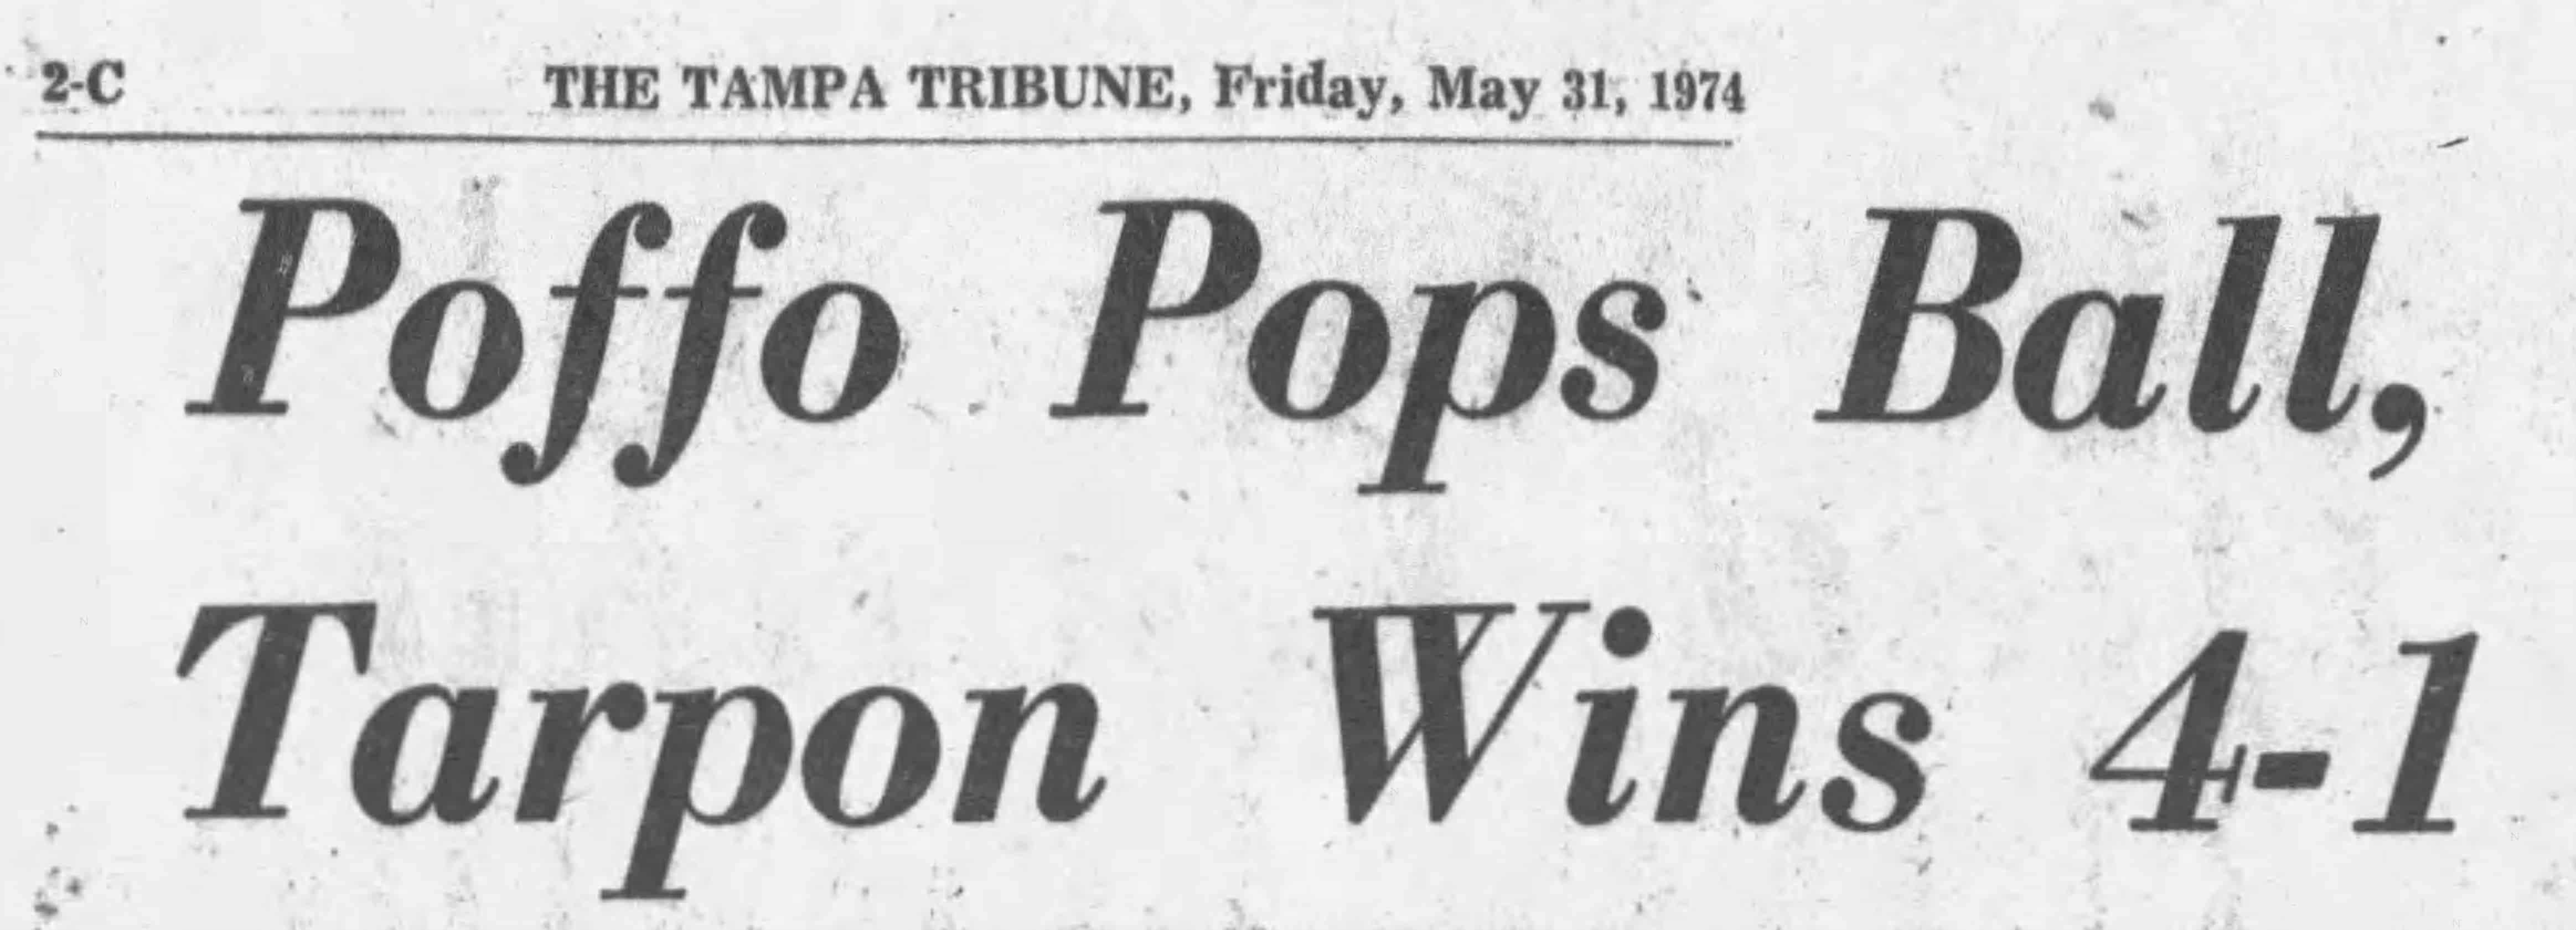 Randy Poffo baseball headline in The Tampa Tribune, Friday, May 31, 1974